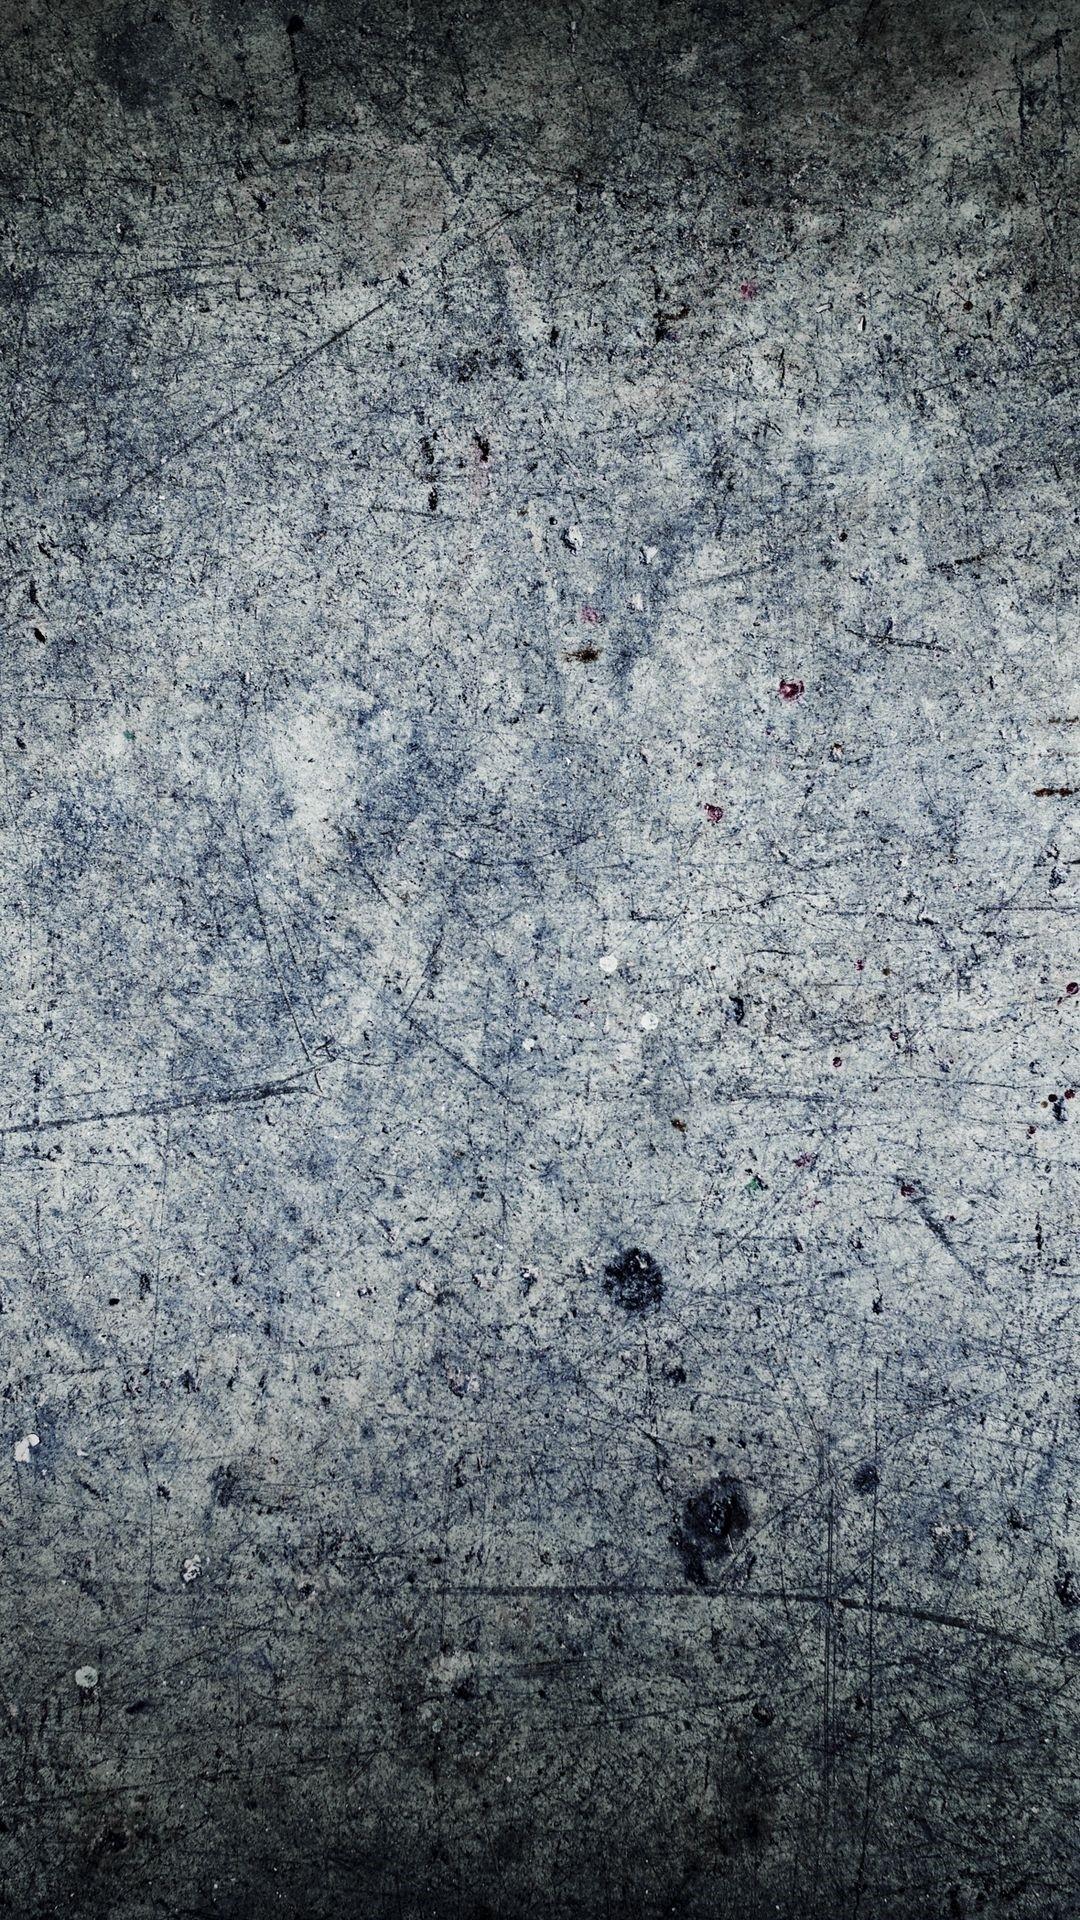 Grunge phone wallpaper hd